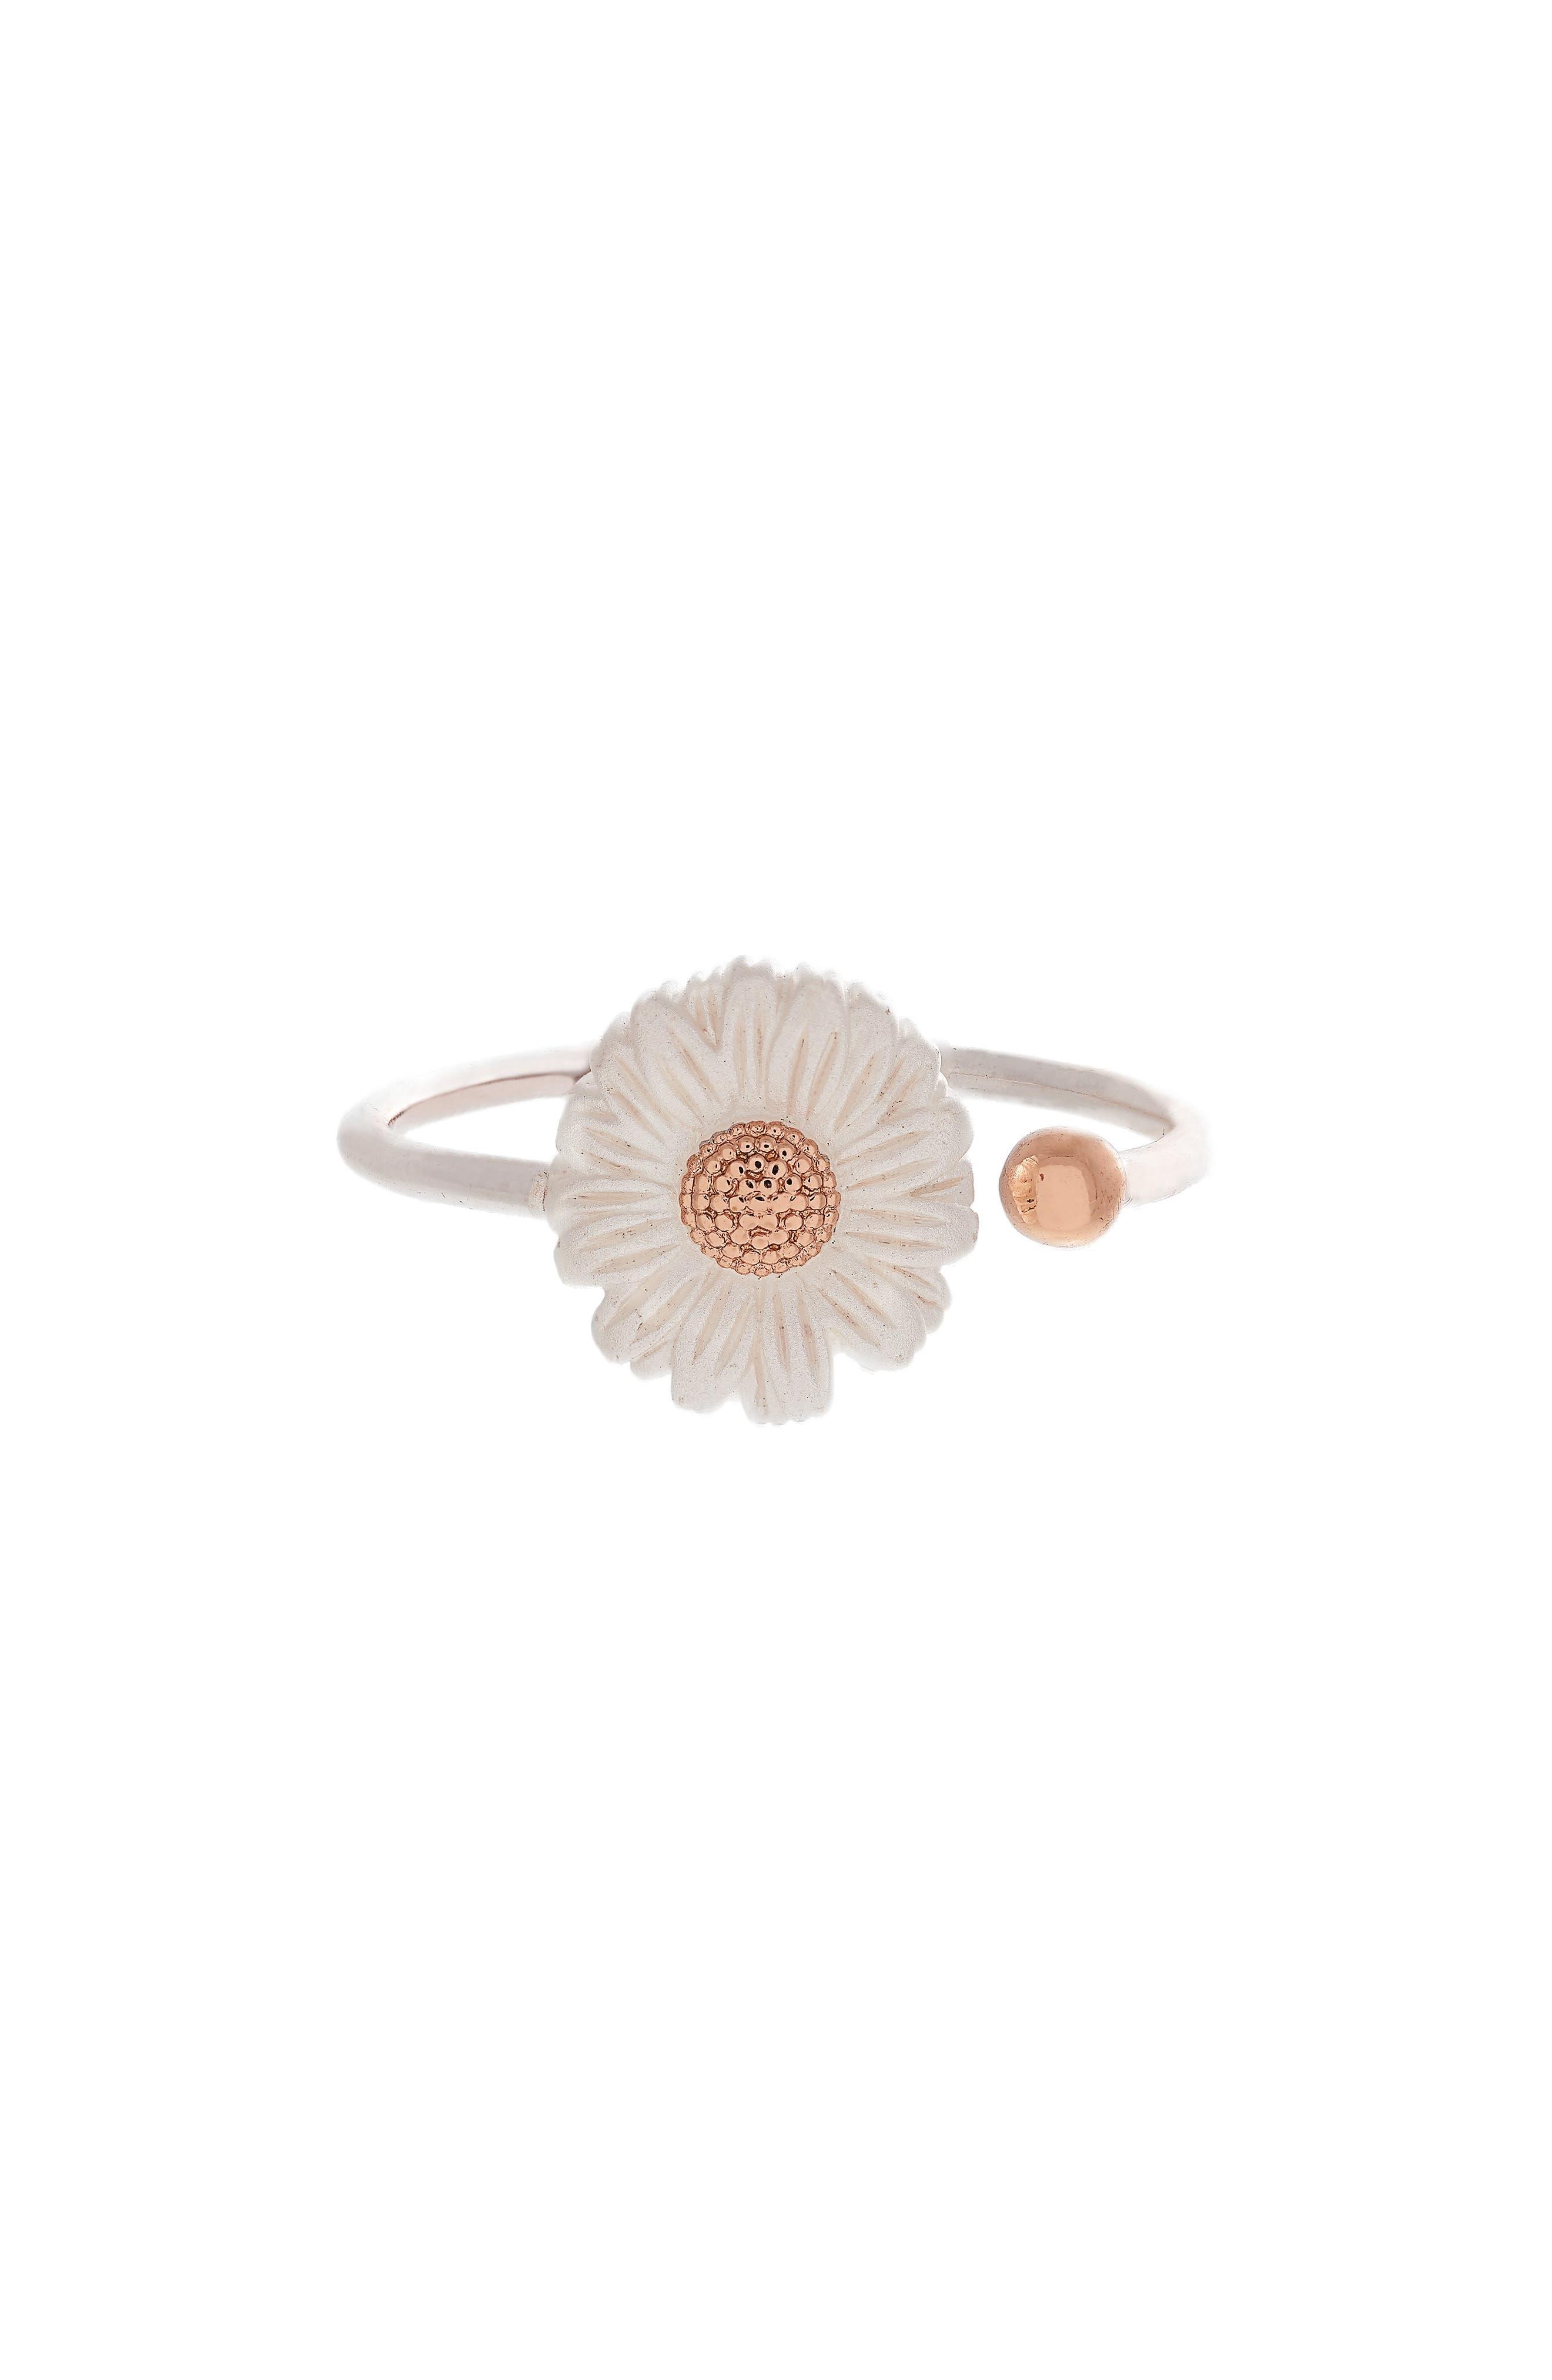 Alternate Image 1 Selected - Olivia Burton Daisy Ring